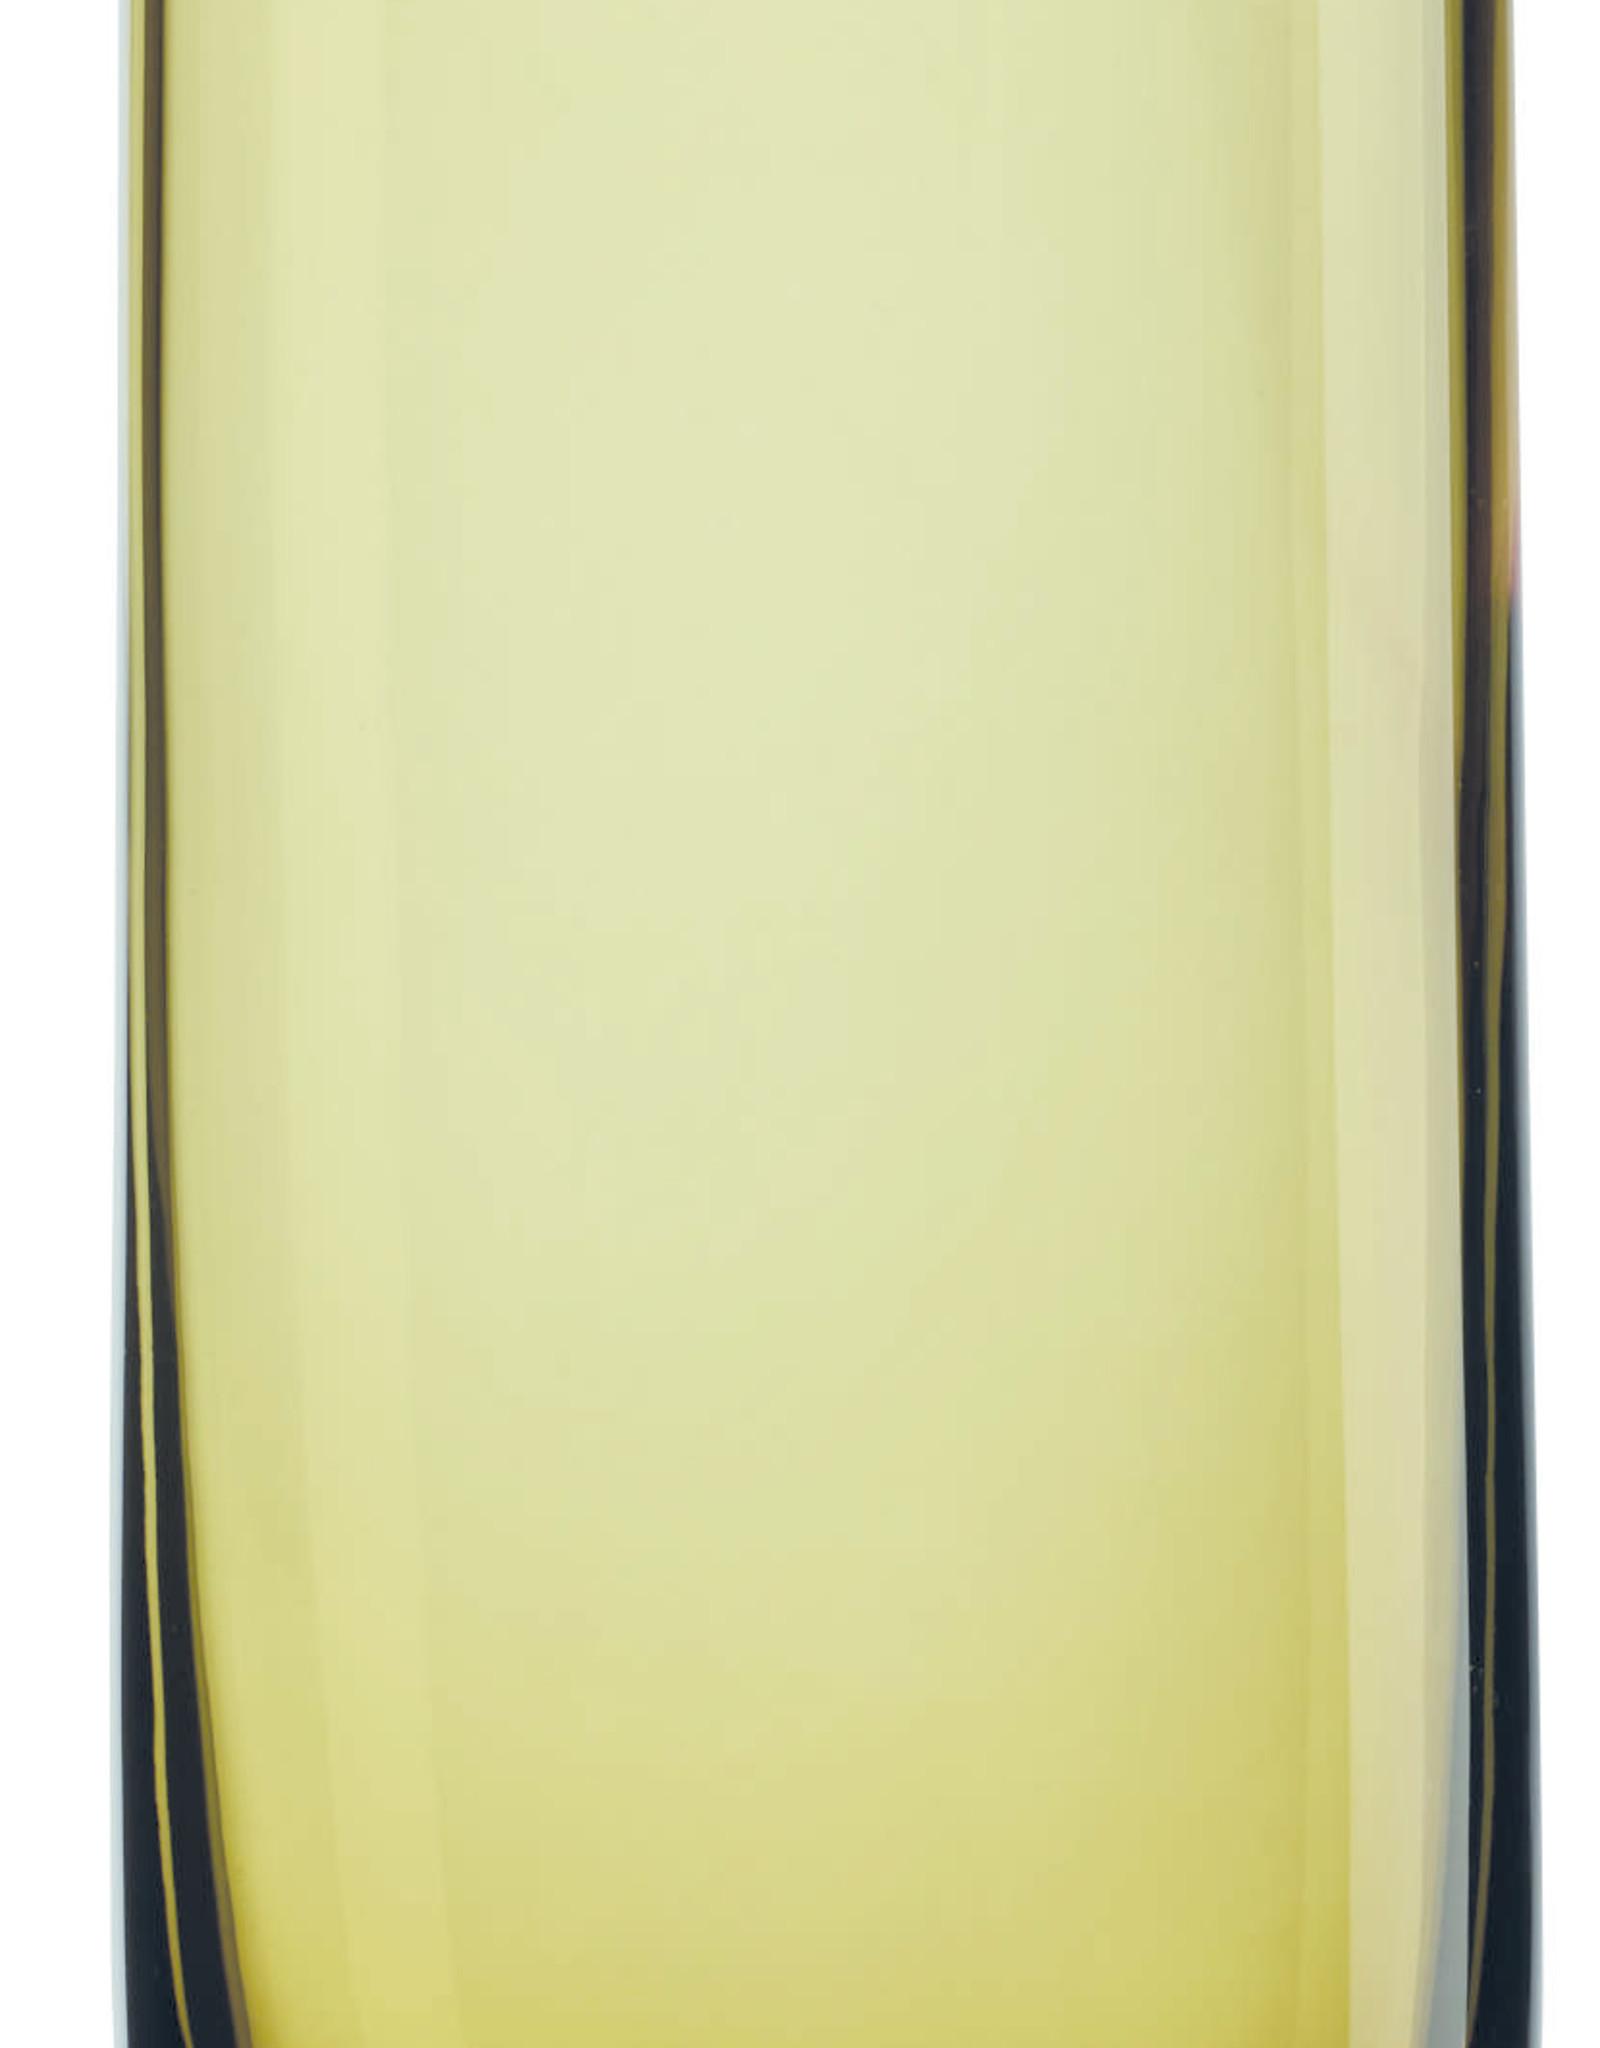 ASA ASA Ajana Vaas Glas Oranje/Amber 29cm